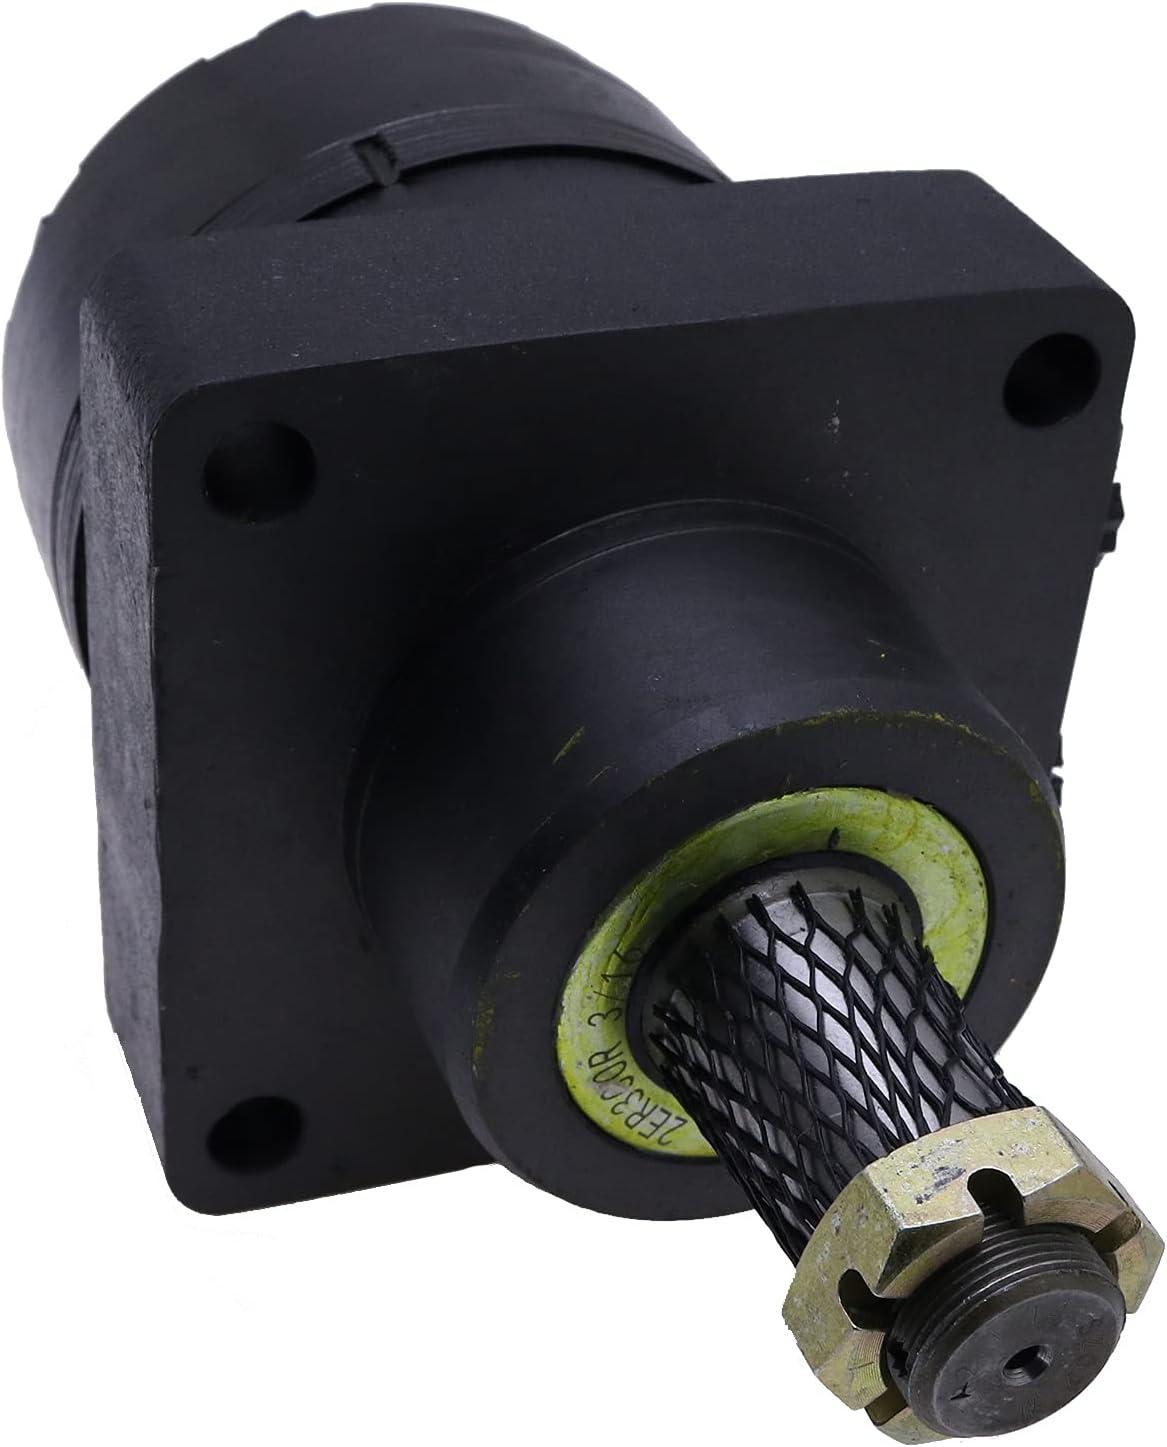 HVACSTAR Hydraulic Drive Motor 194615 SJIII SkyJack for All items free shipping Topics on TV 3 103129